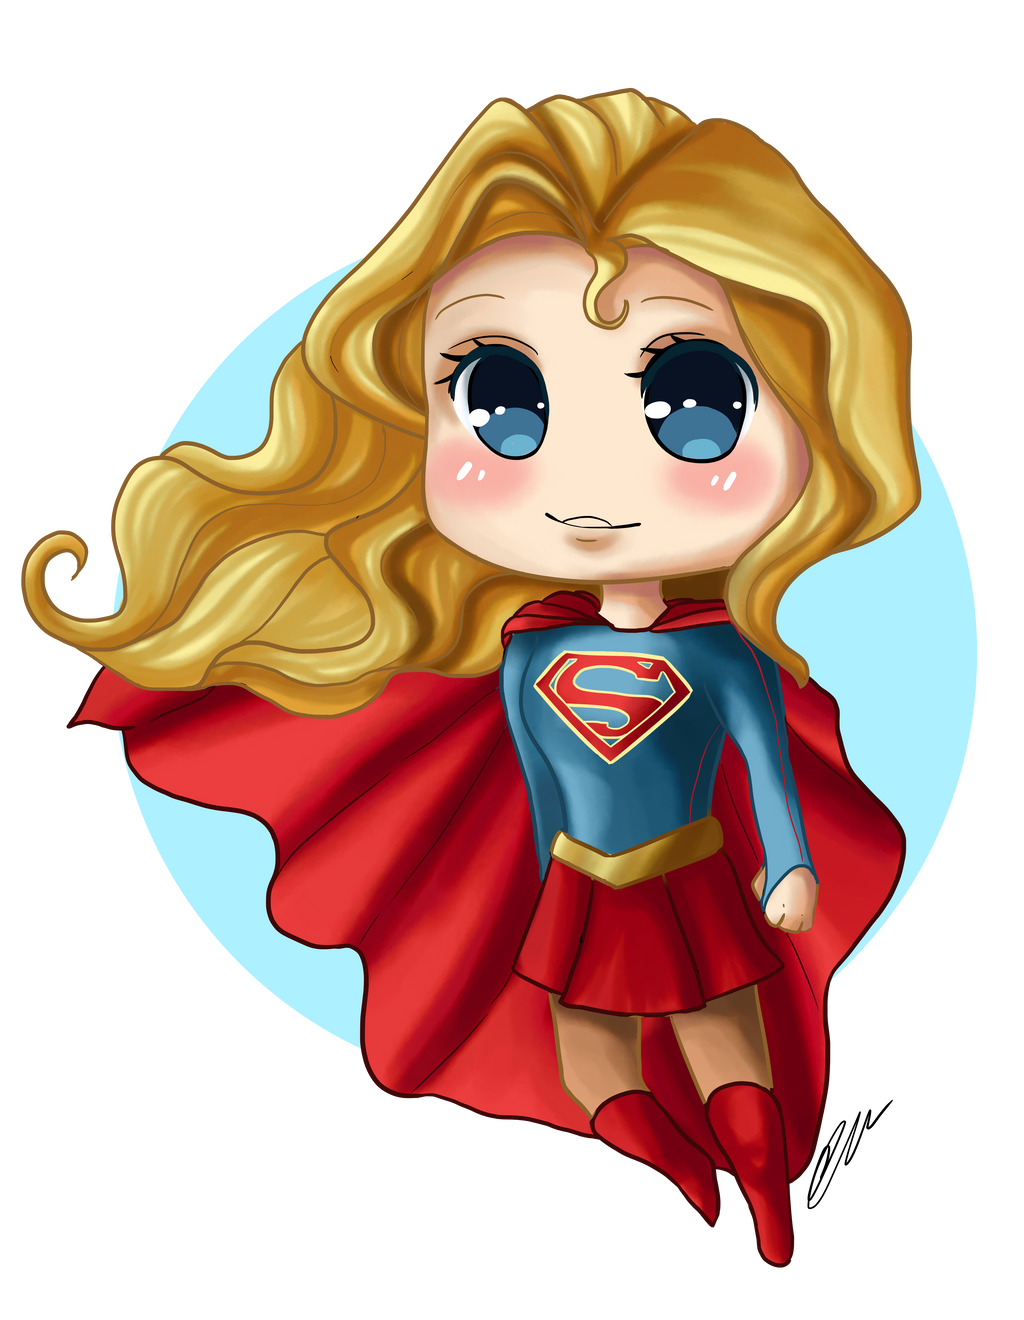 Supergirl Chibi (Video) by artbox99 on DeviantArt